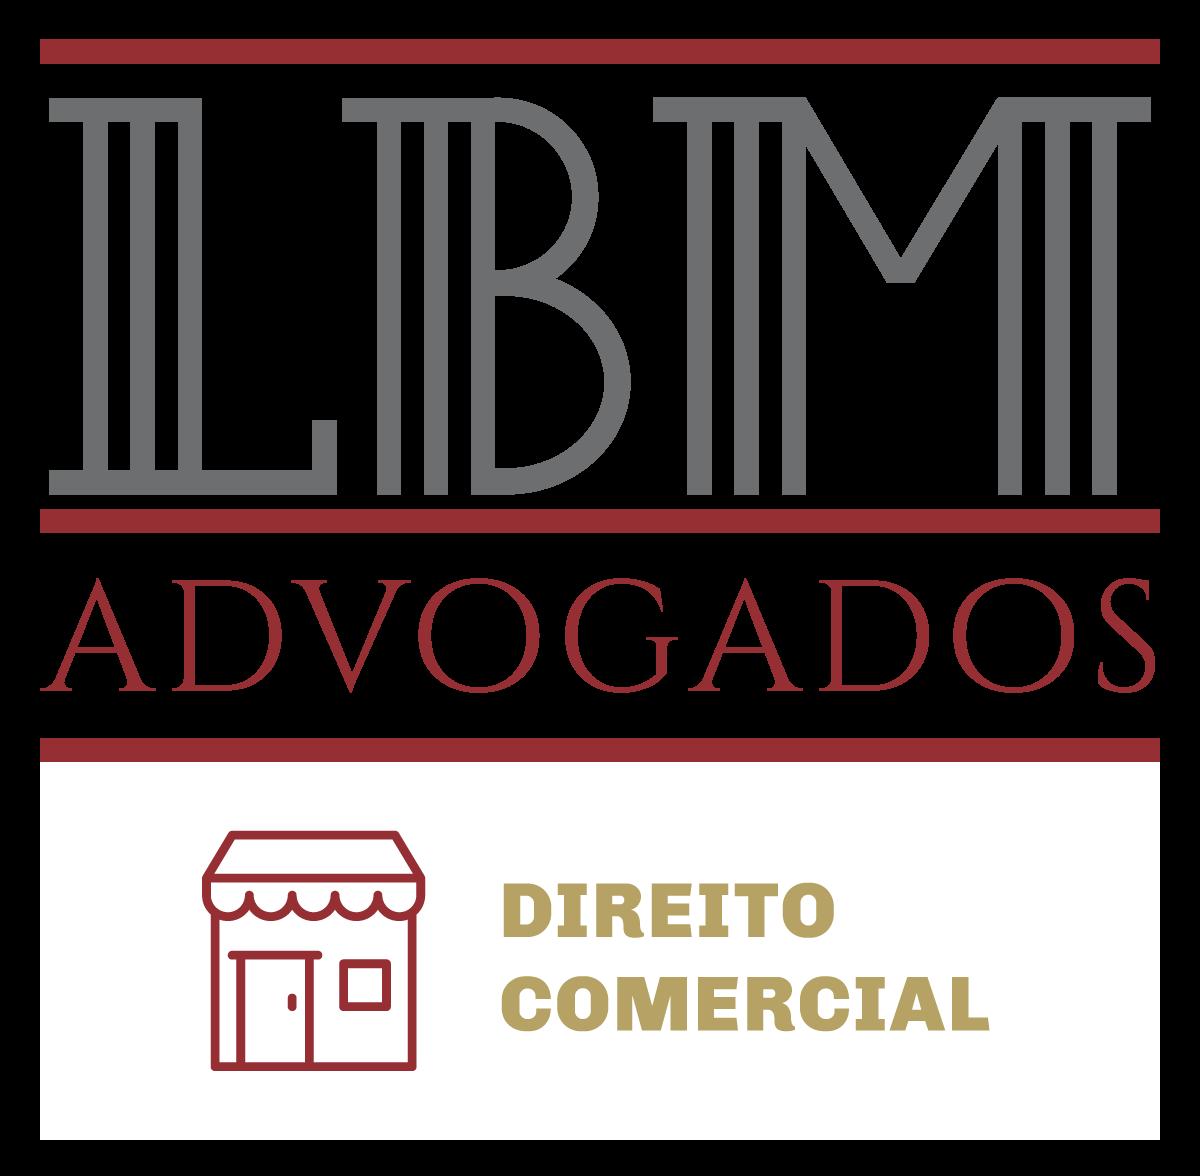 Advogados Direito Comercial